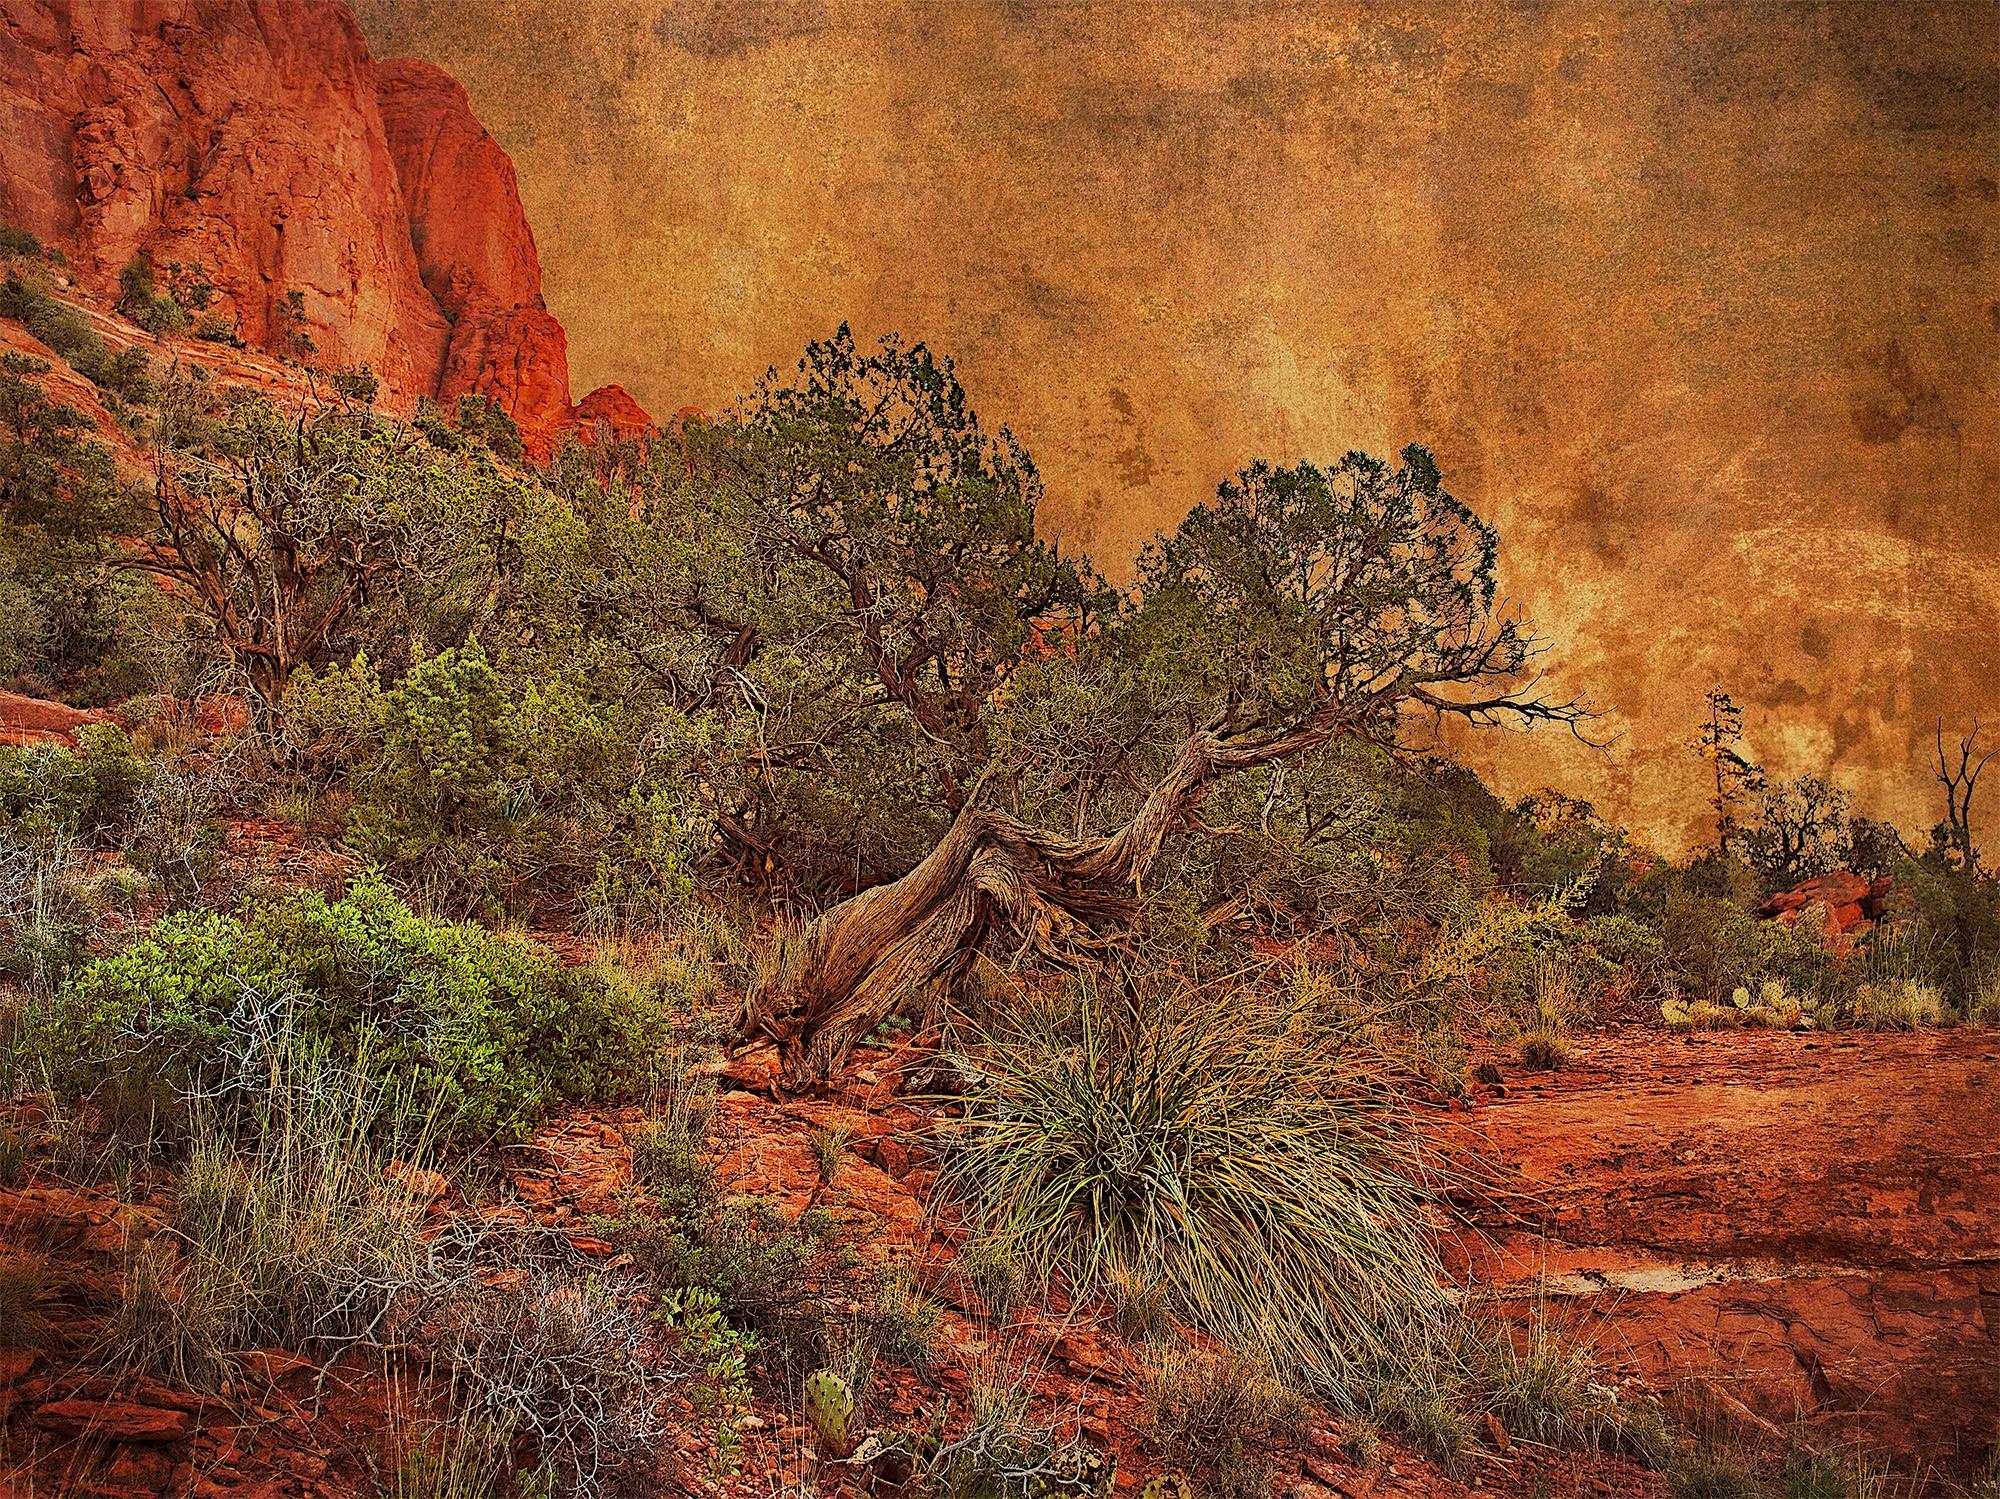 Juniper with Redrocks by Bob Coates